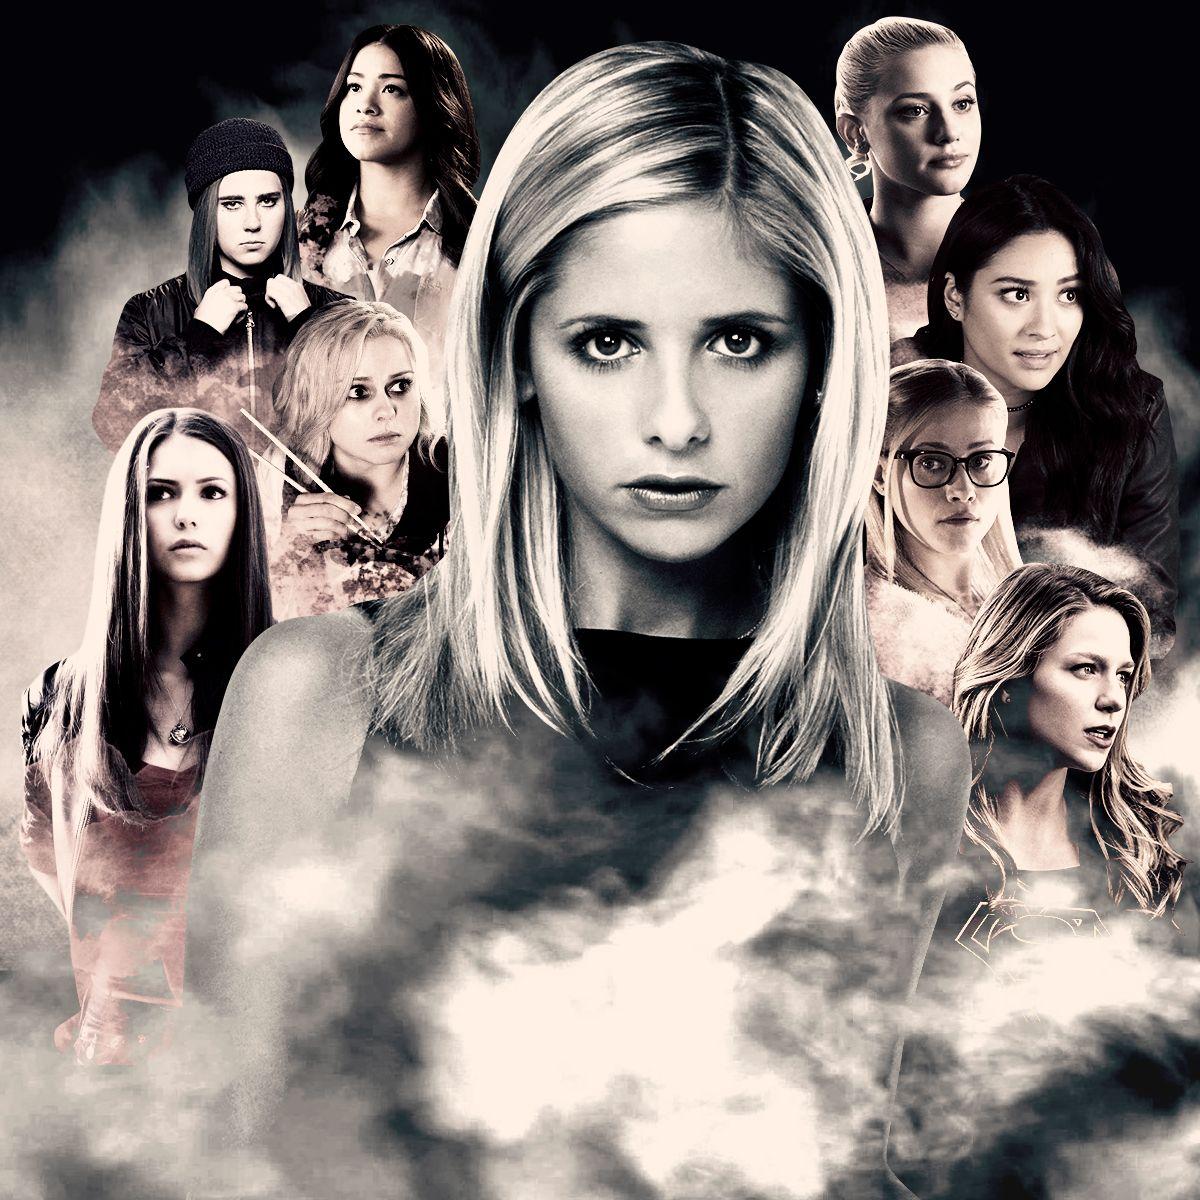 13 TV Shows to Watch If You Miss \u0027Buffy the Vampire Slayer\u0027